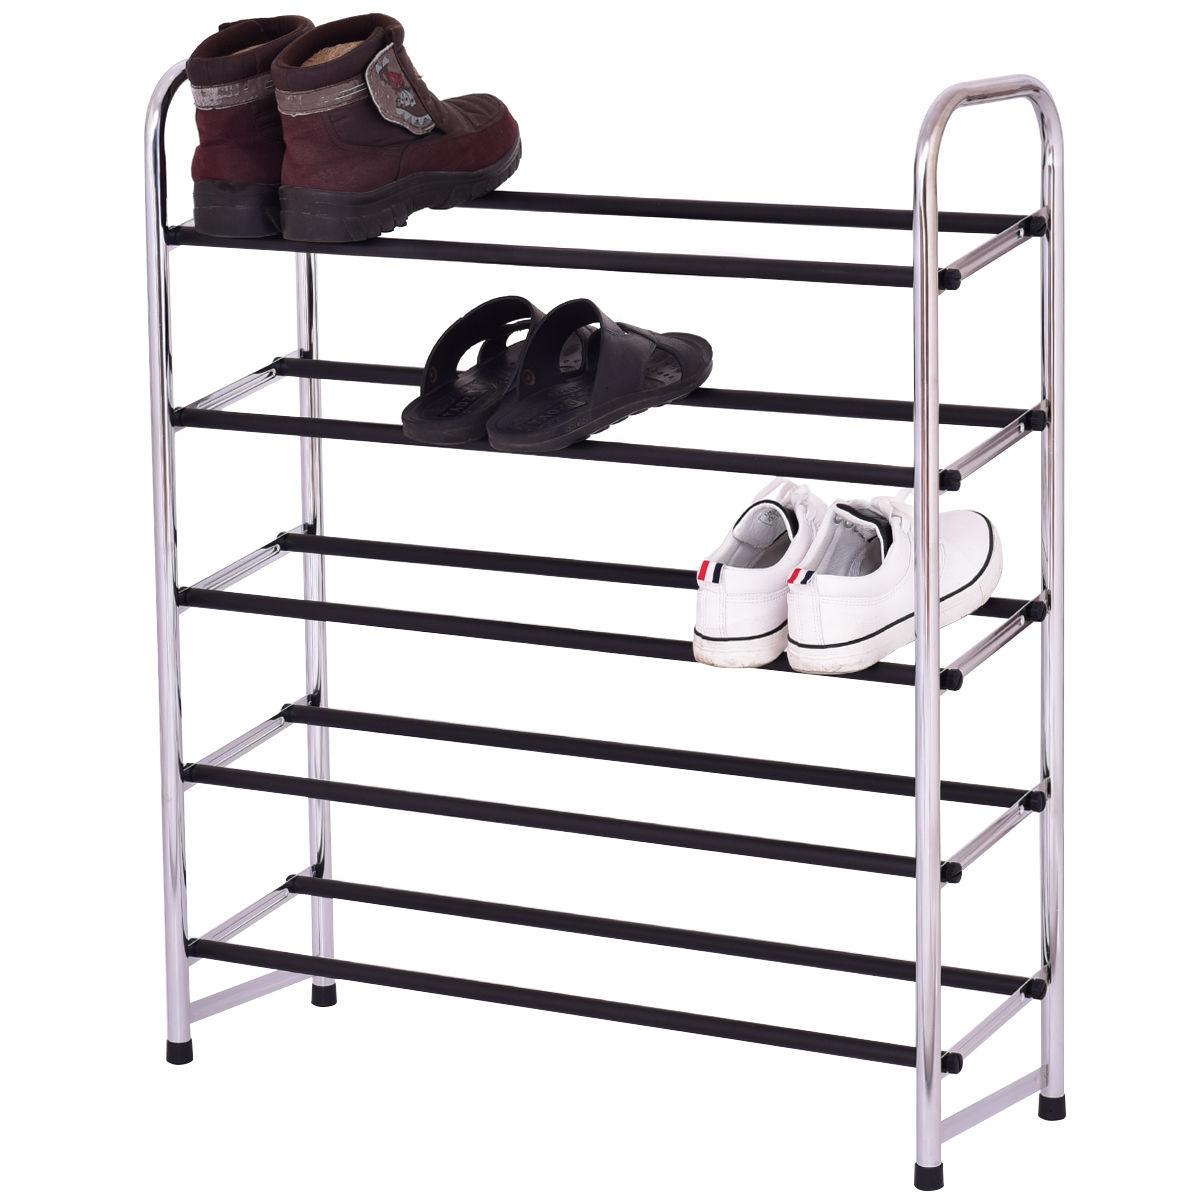 Giantex 5-Tier Mobile Shoe Rack Tower Living Room Storage Shelf Shoes Holder Organizer Modern Home Furniture HW55252<br>